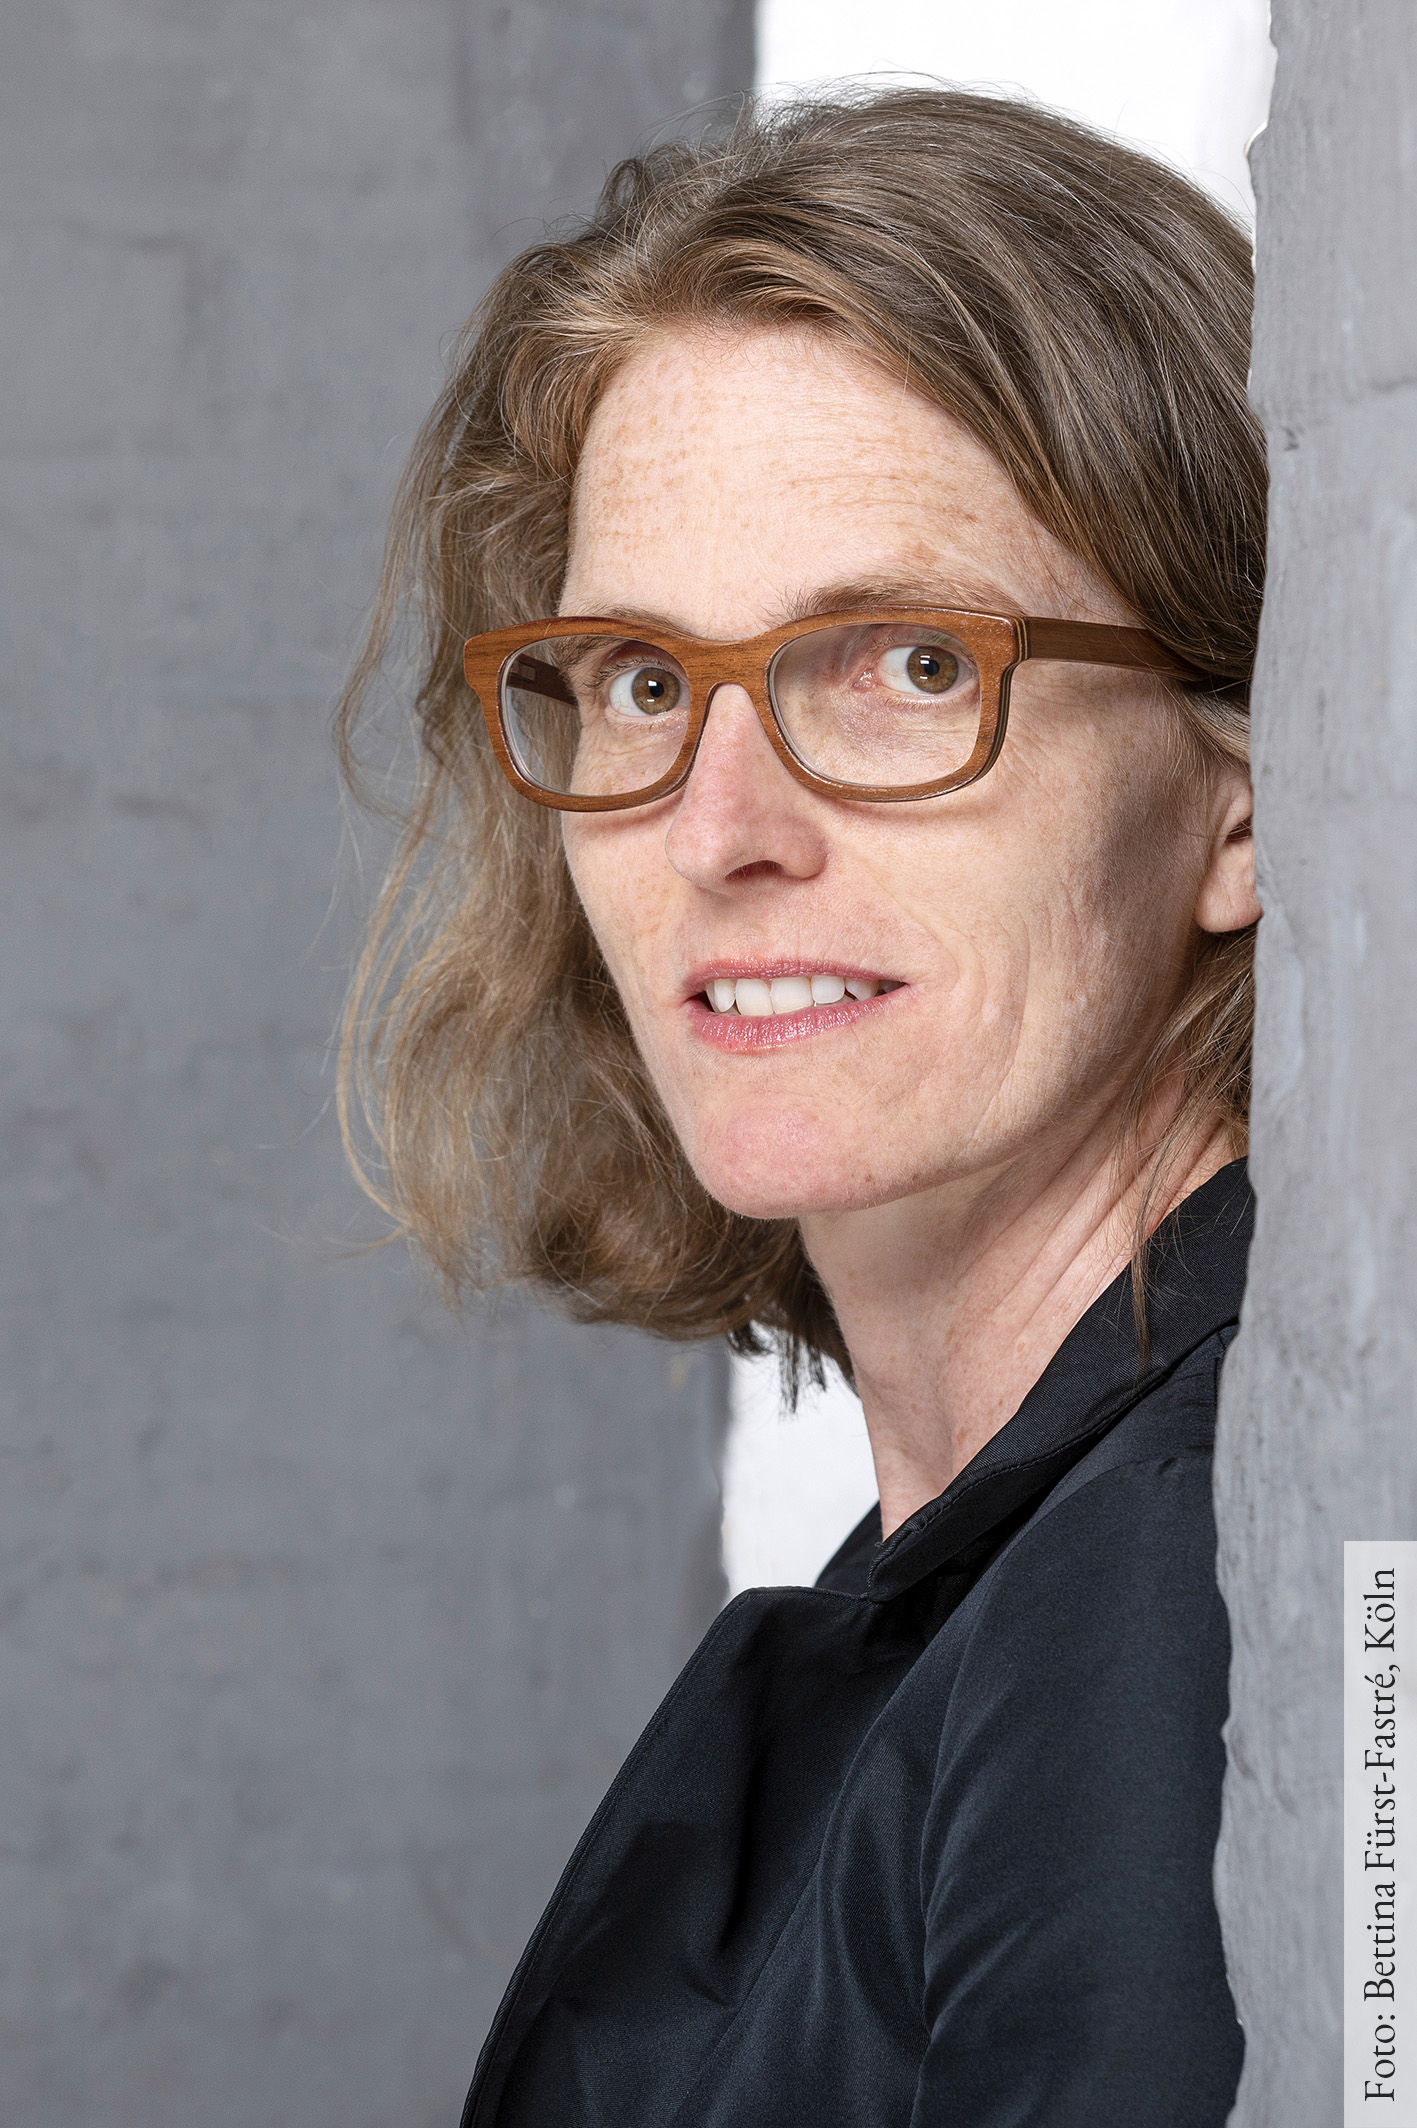 Angela Glajcar, Foto: Bettina Fürst-Fastré (Köln)